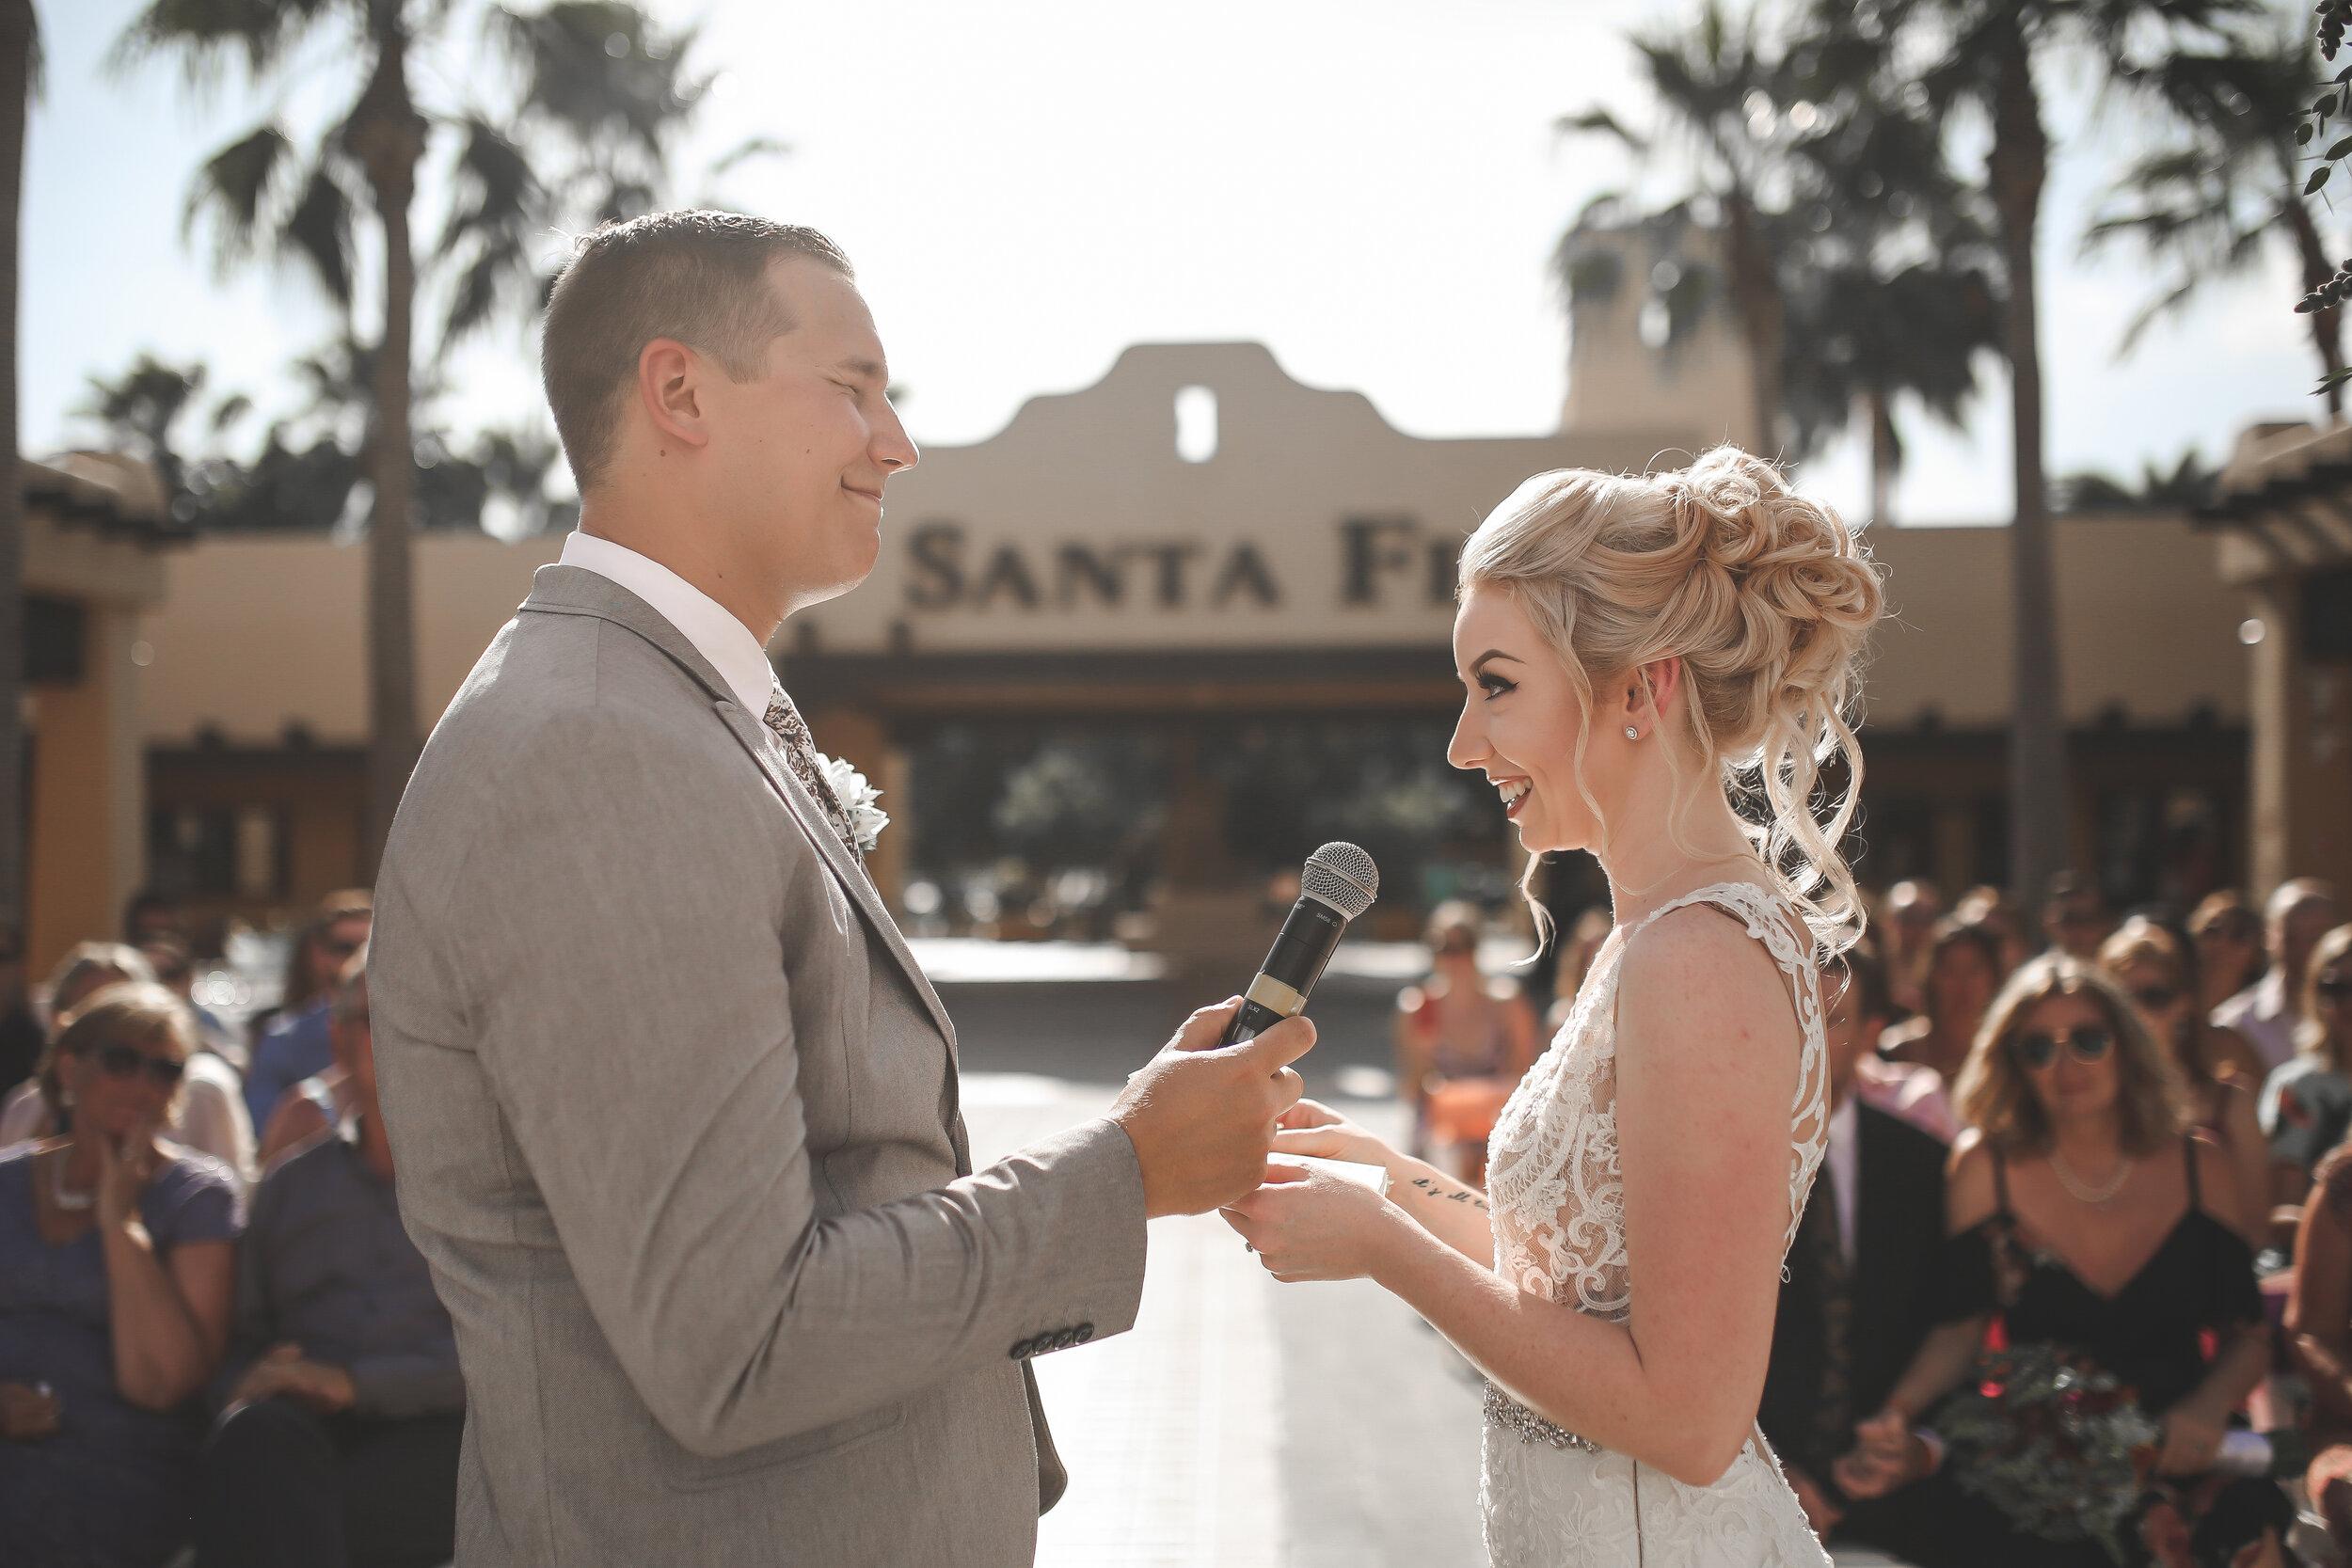 193-Adam-Ziorio-Photography-VictoriaBC-Weddings&Elopements.jpg